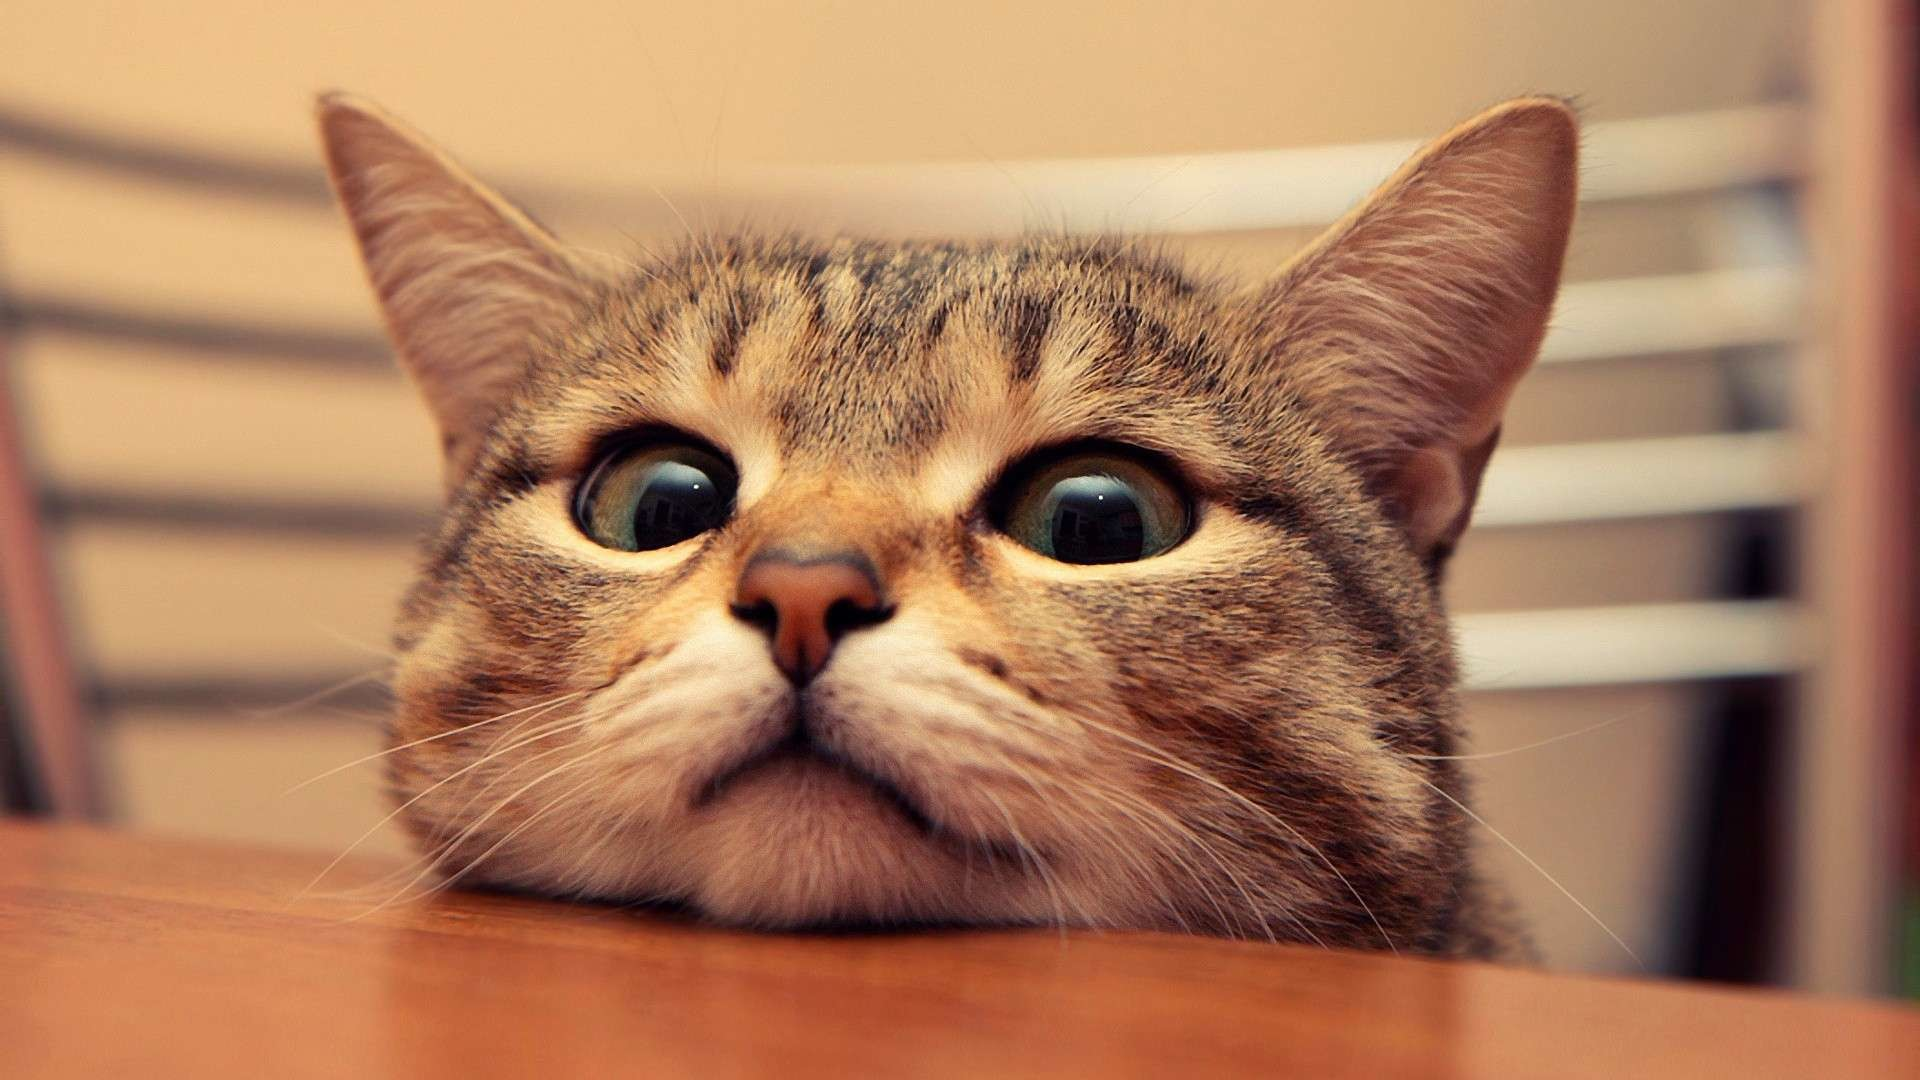 Cat Wallpaper Tumblr.